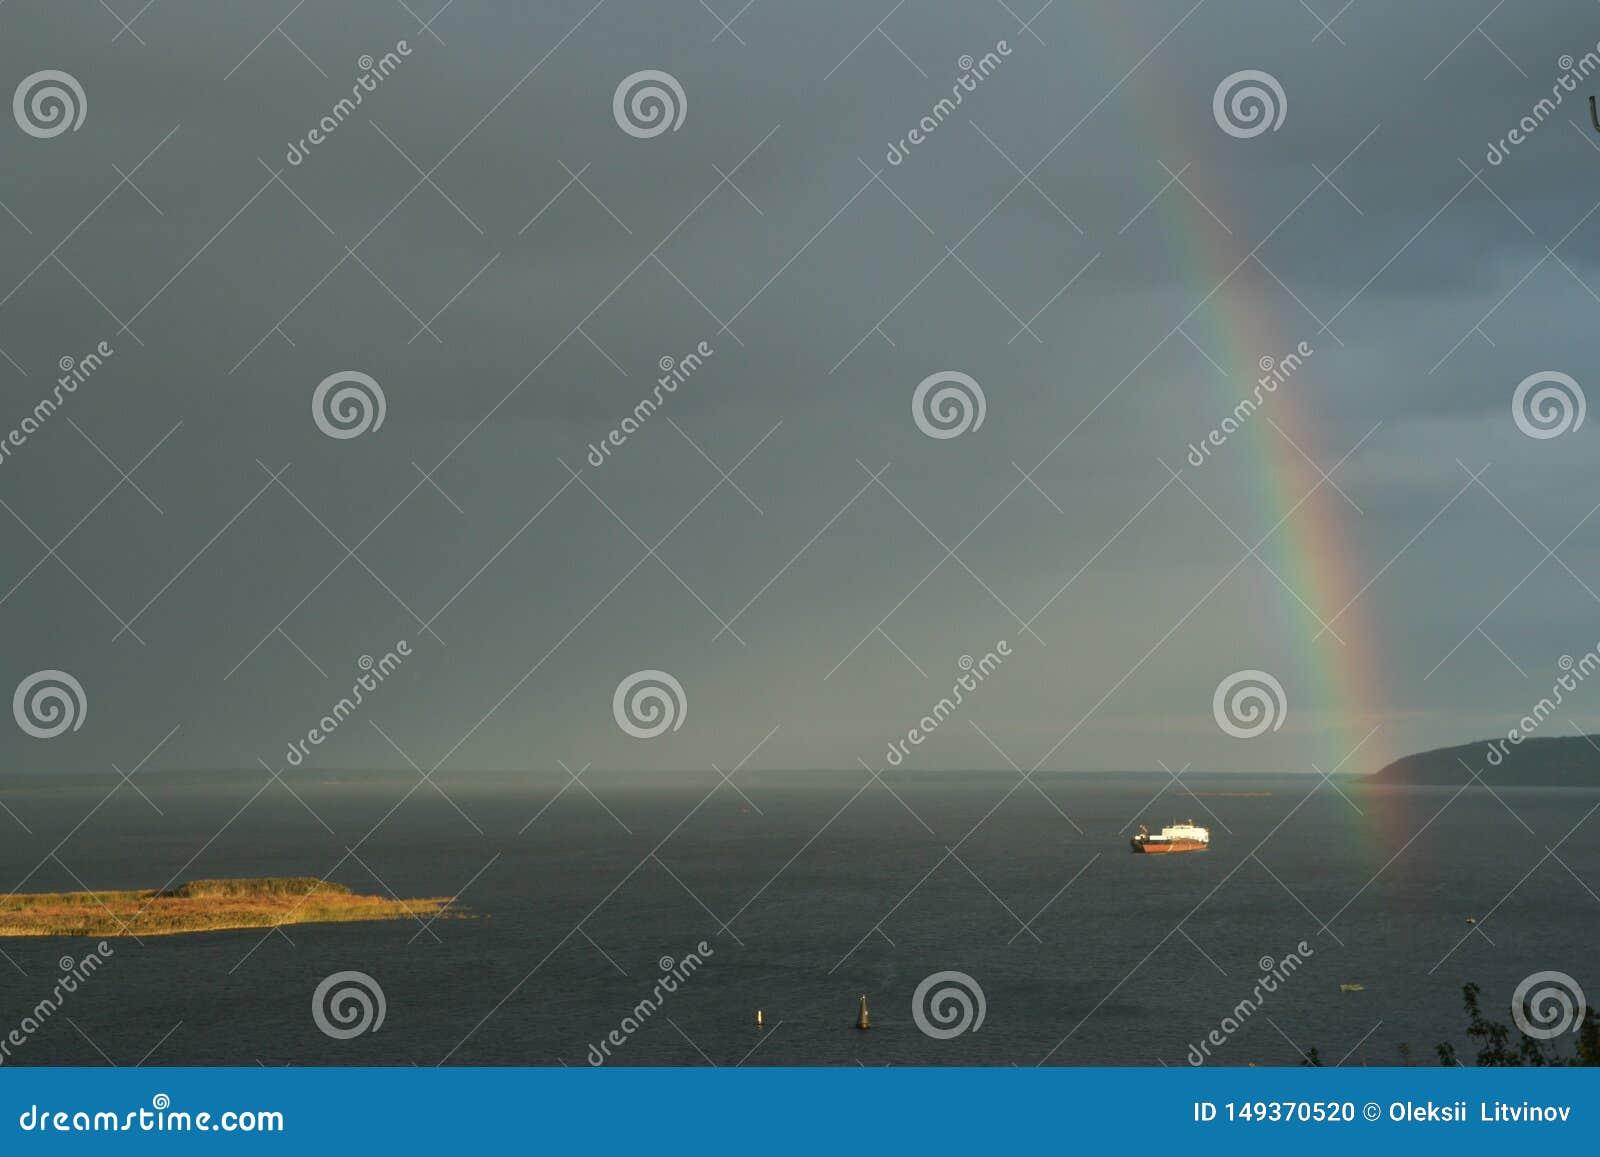 Nave sola en el r?o y un arco iris en el cielo